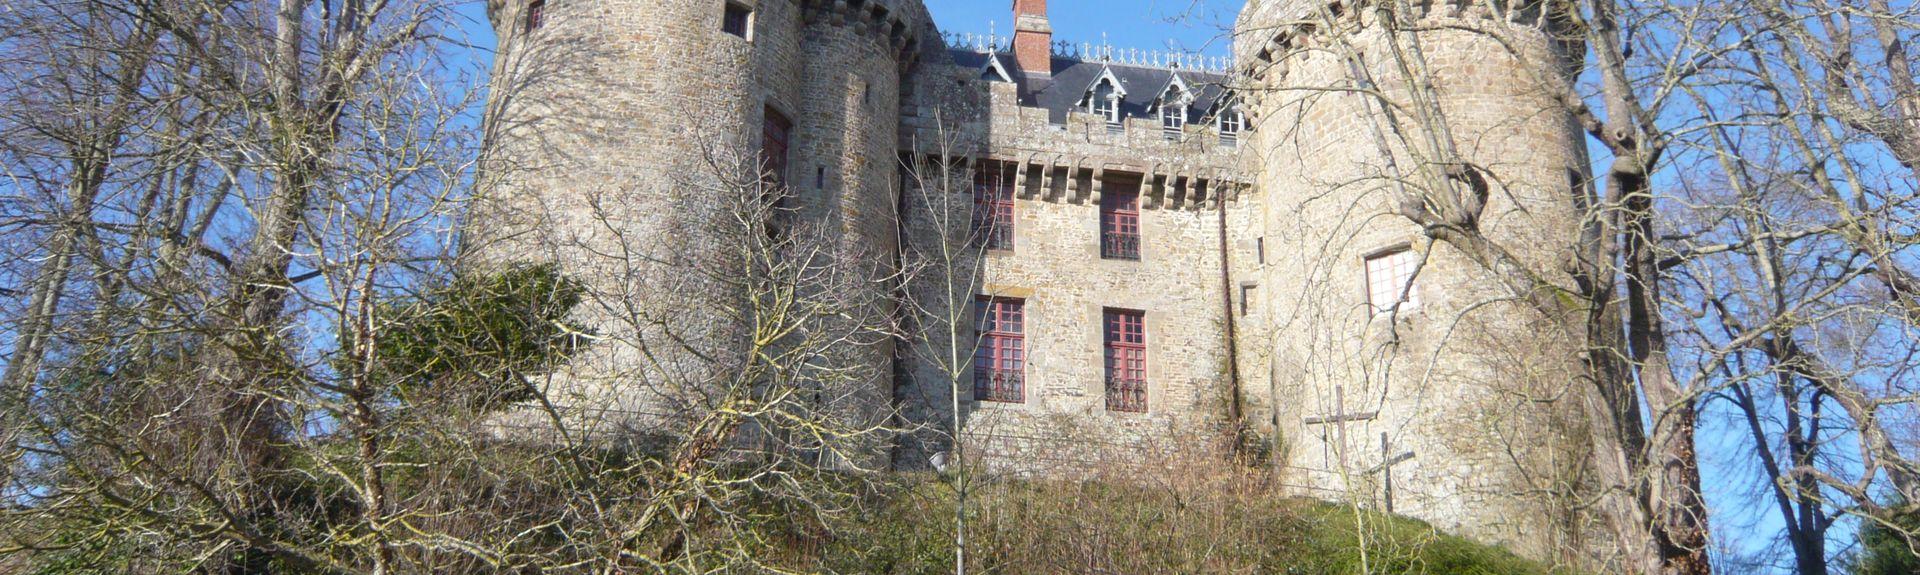 Pleine-Fougères, Bretagne, Ranska